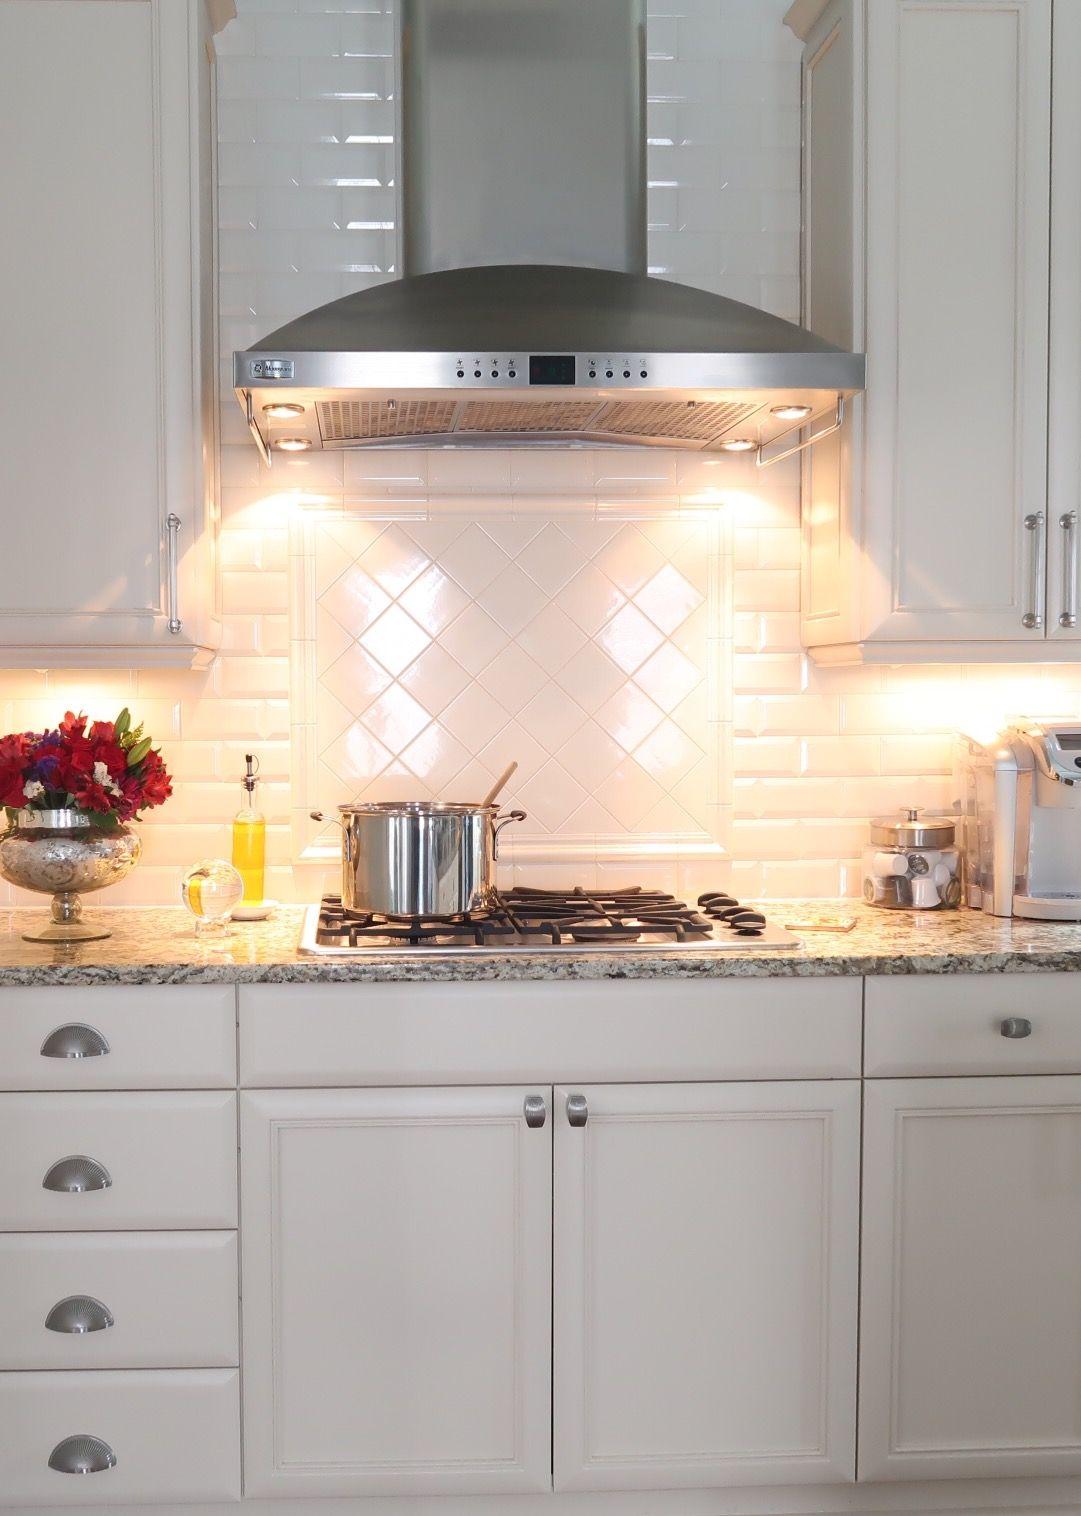 Subway Tile Backsplash And Feature Design Under Hood Kitchen